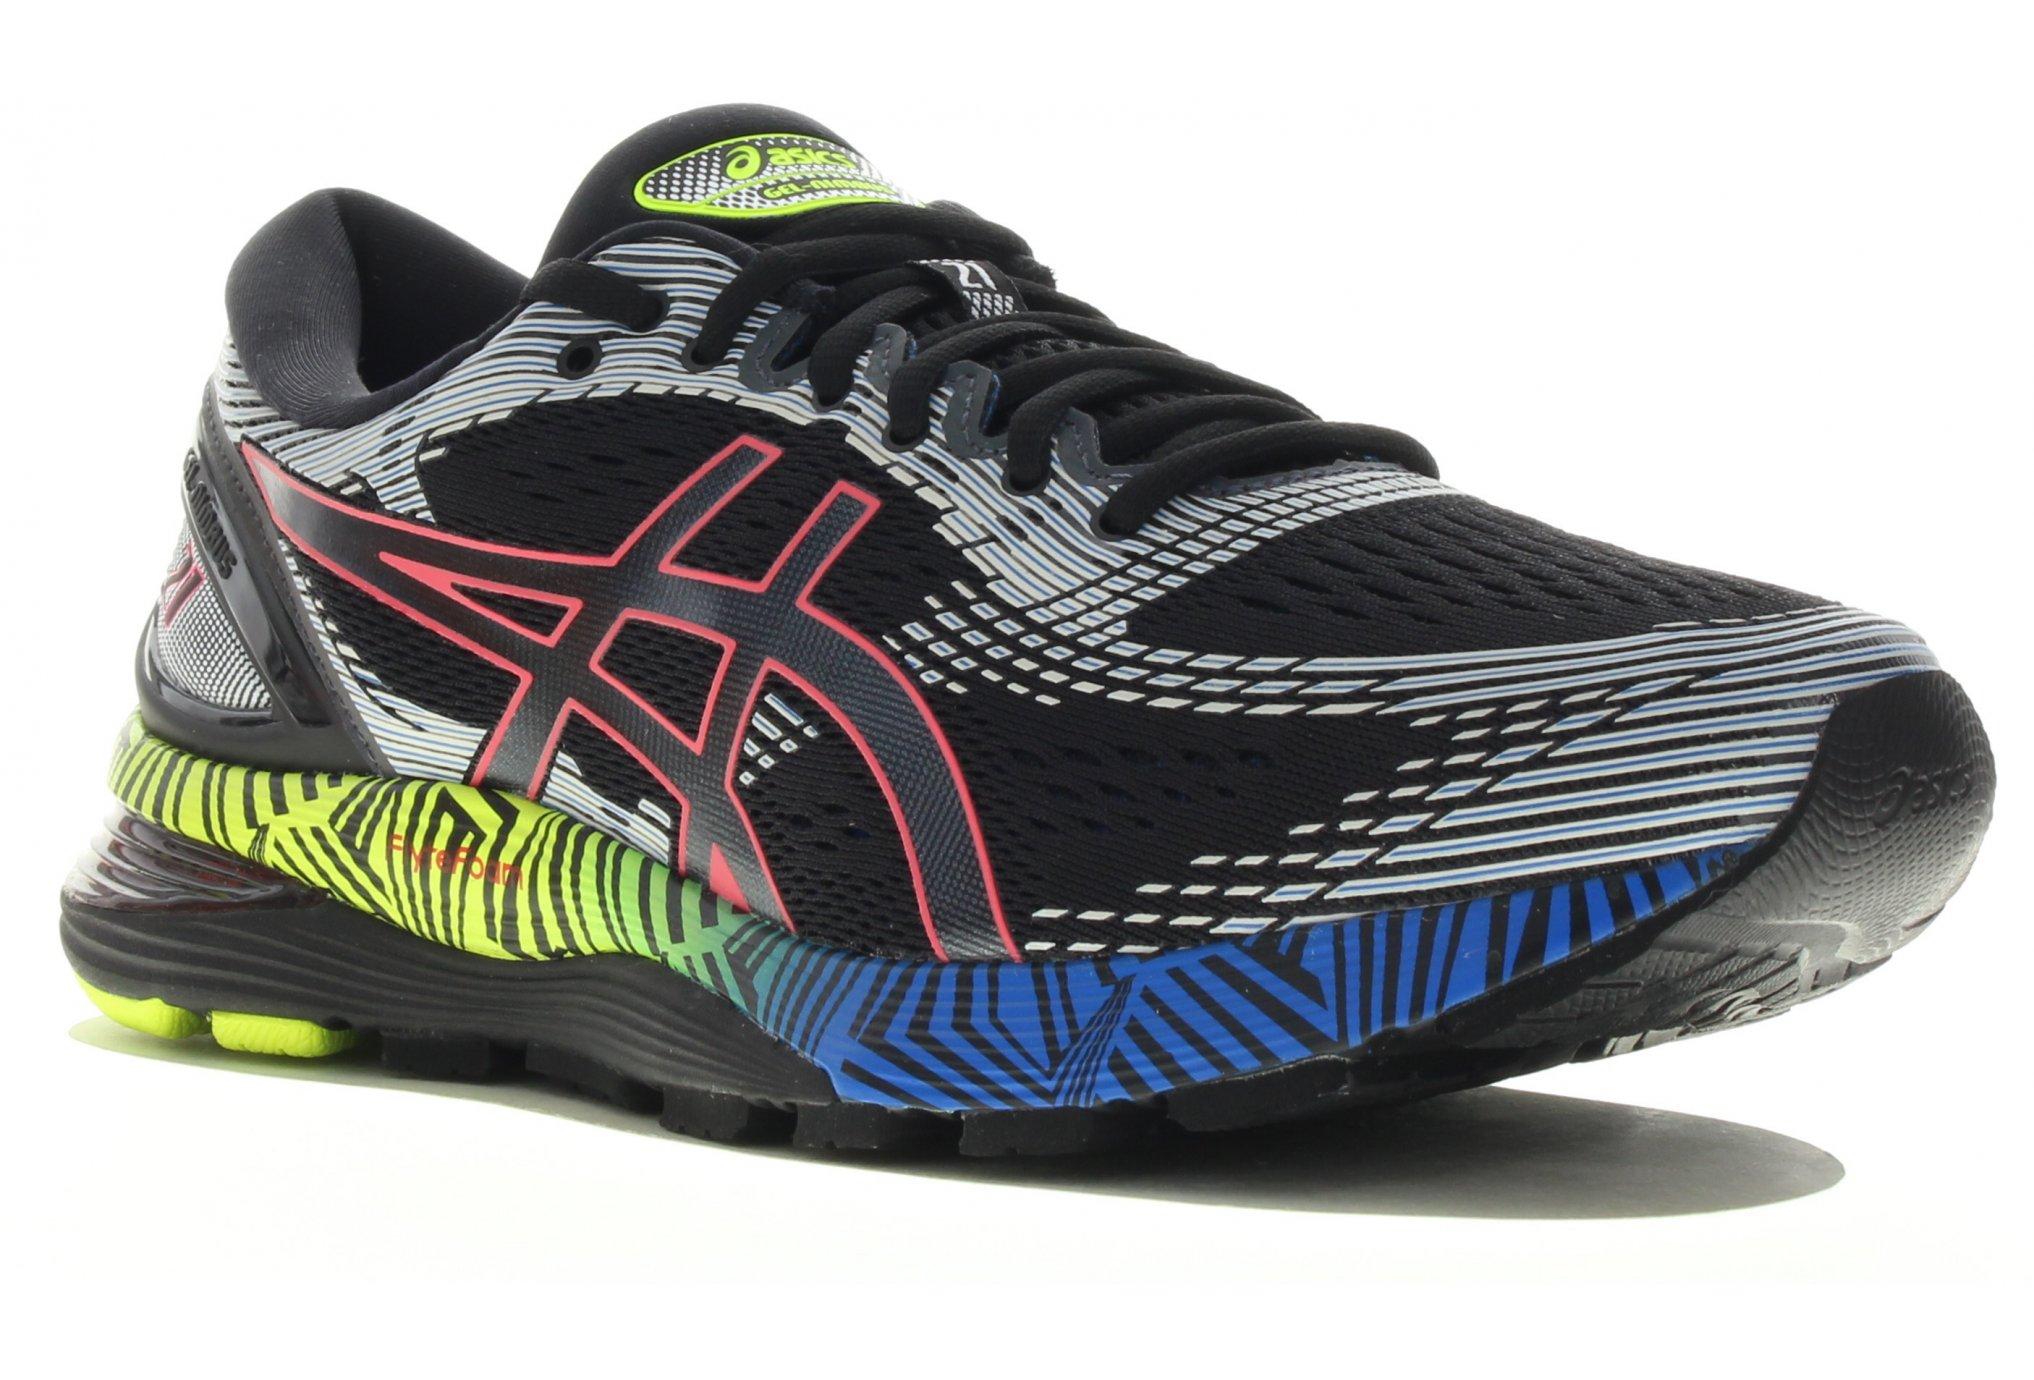 Asics Gel-Nimbus 21 Expert M Chaussures homme